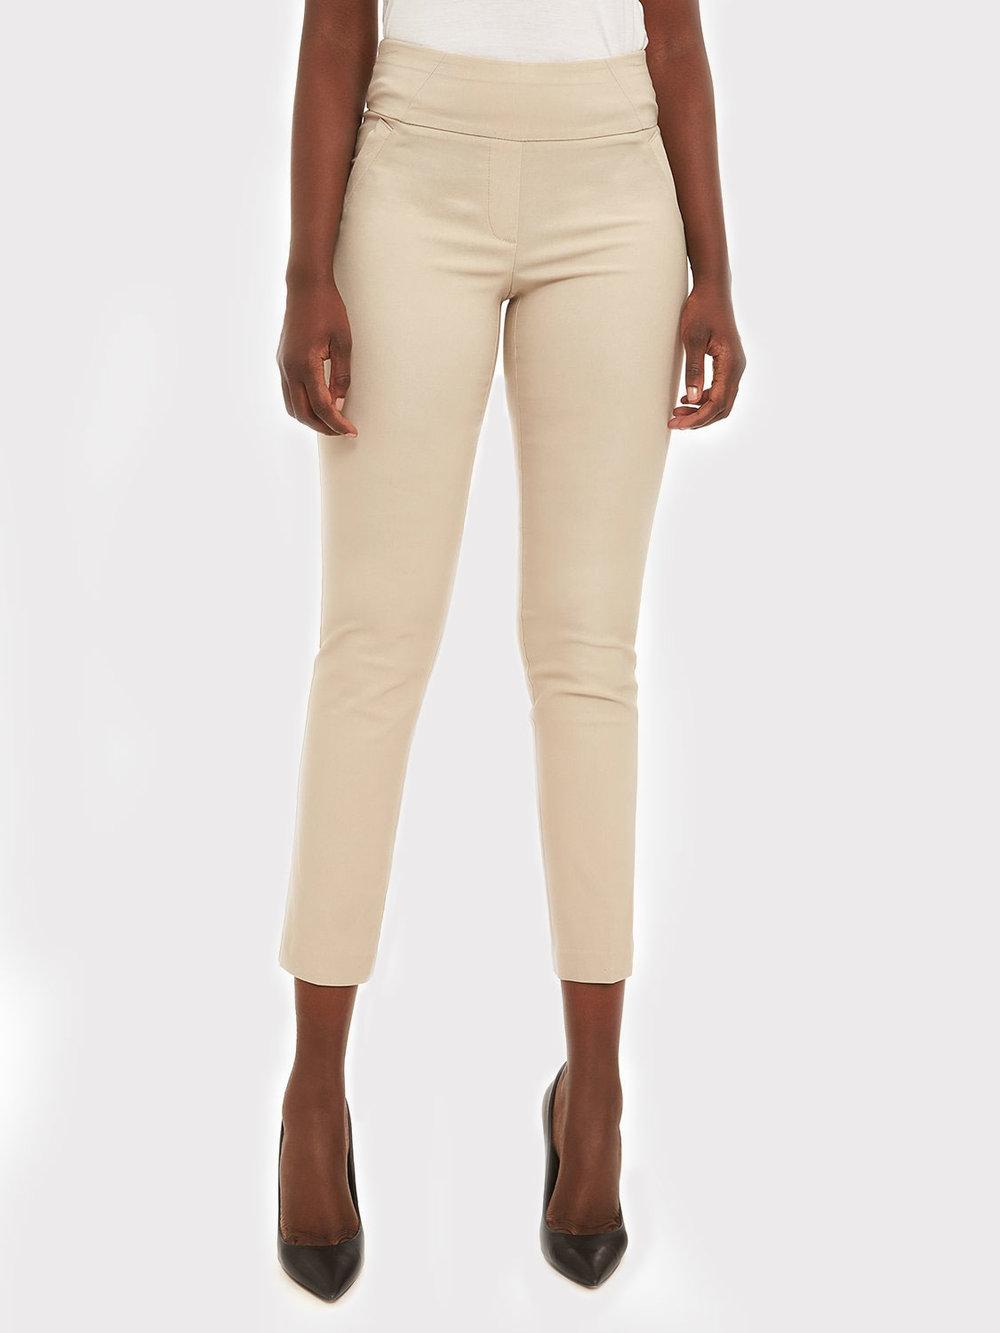 Ankle Length Woven Pants